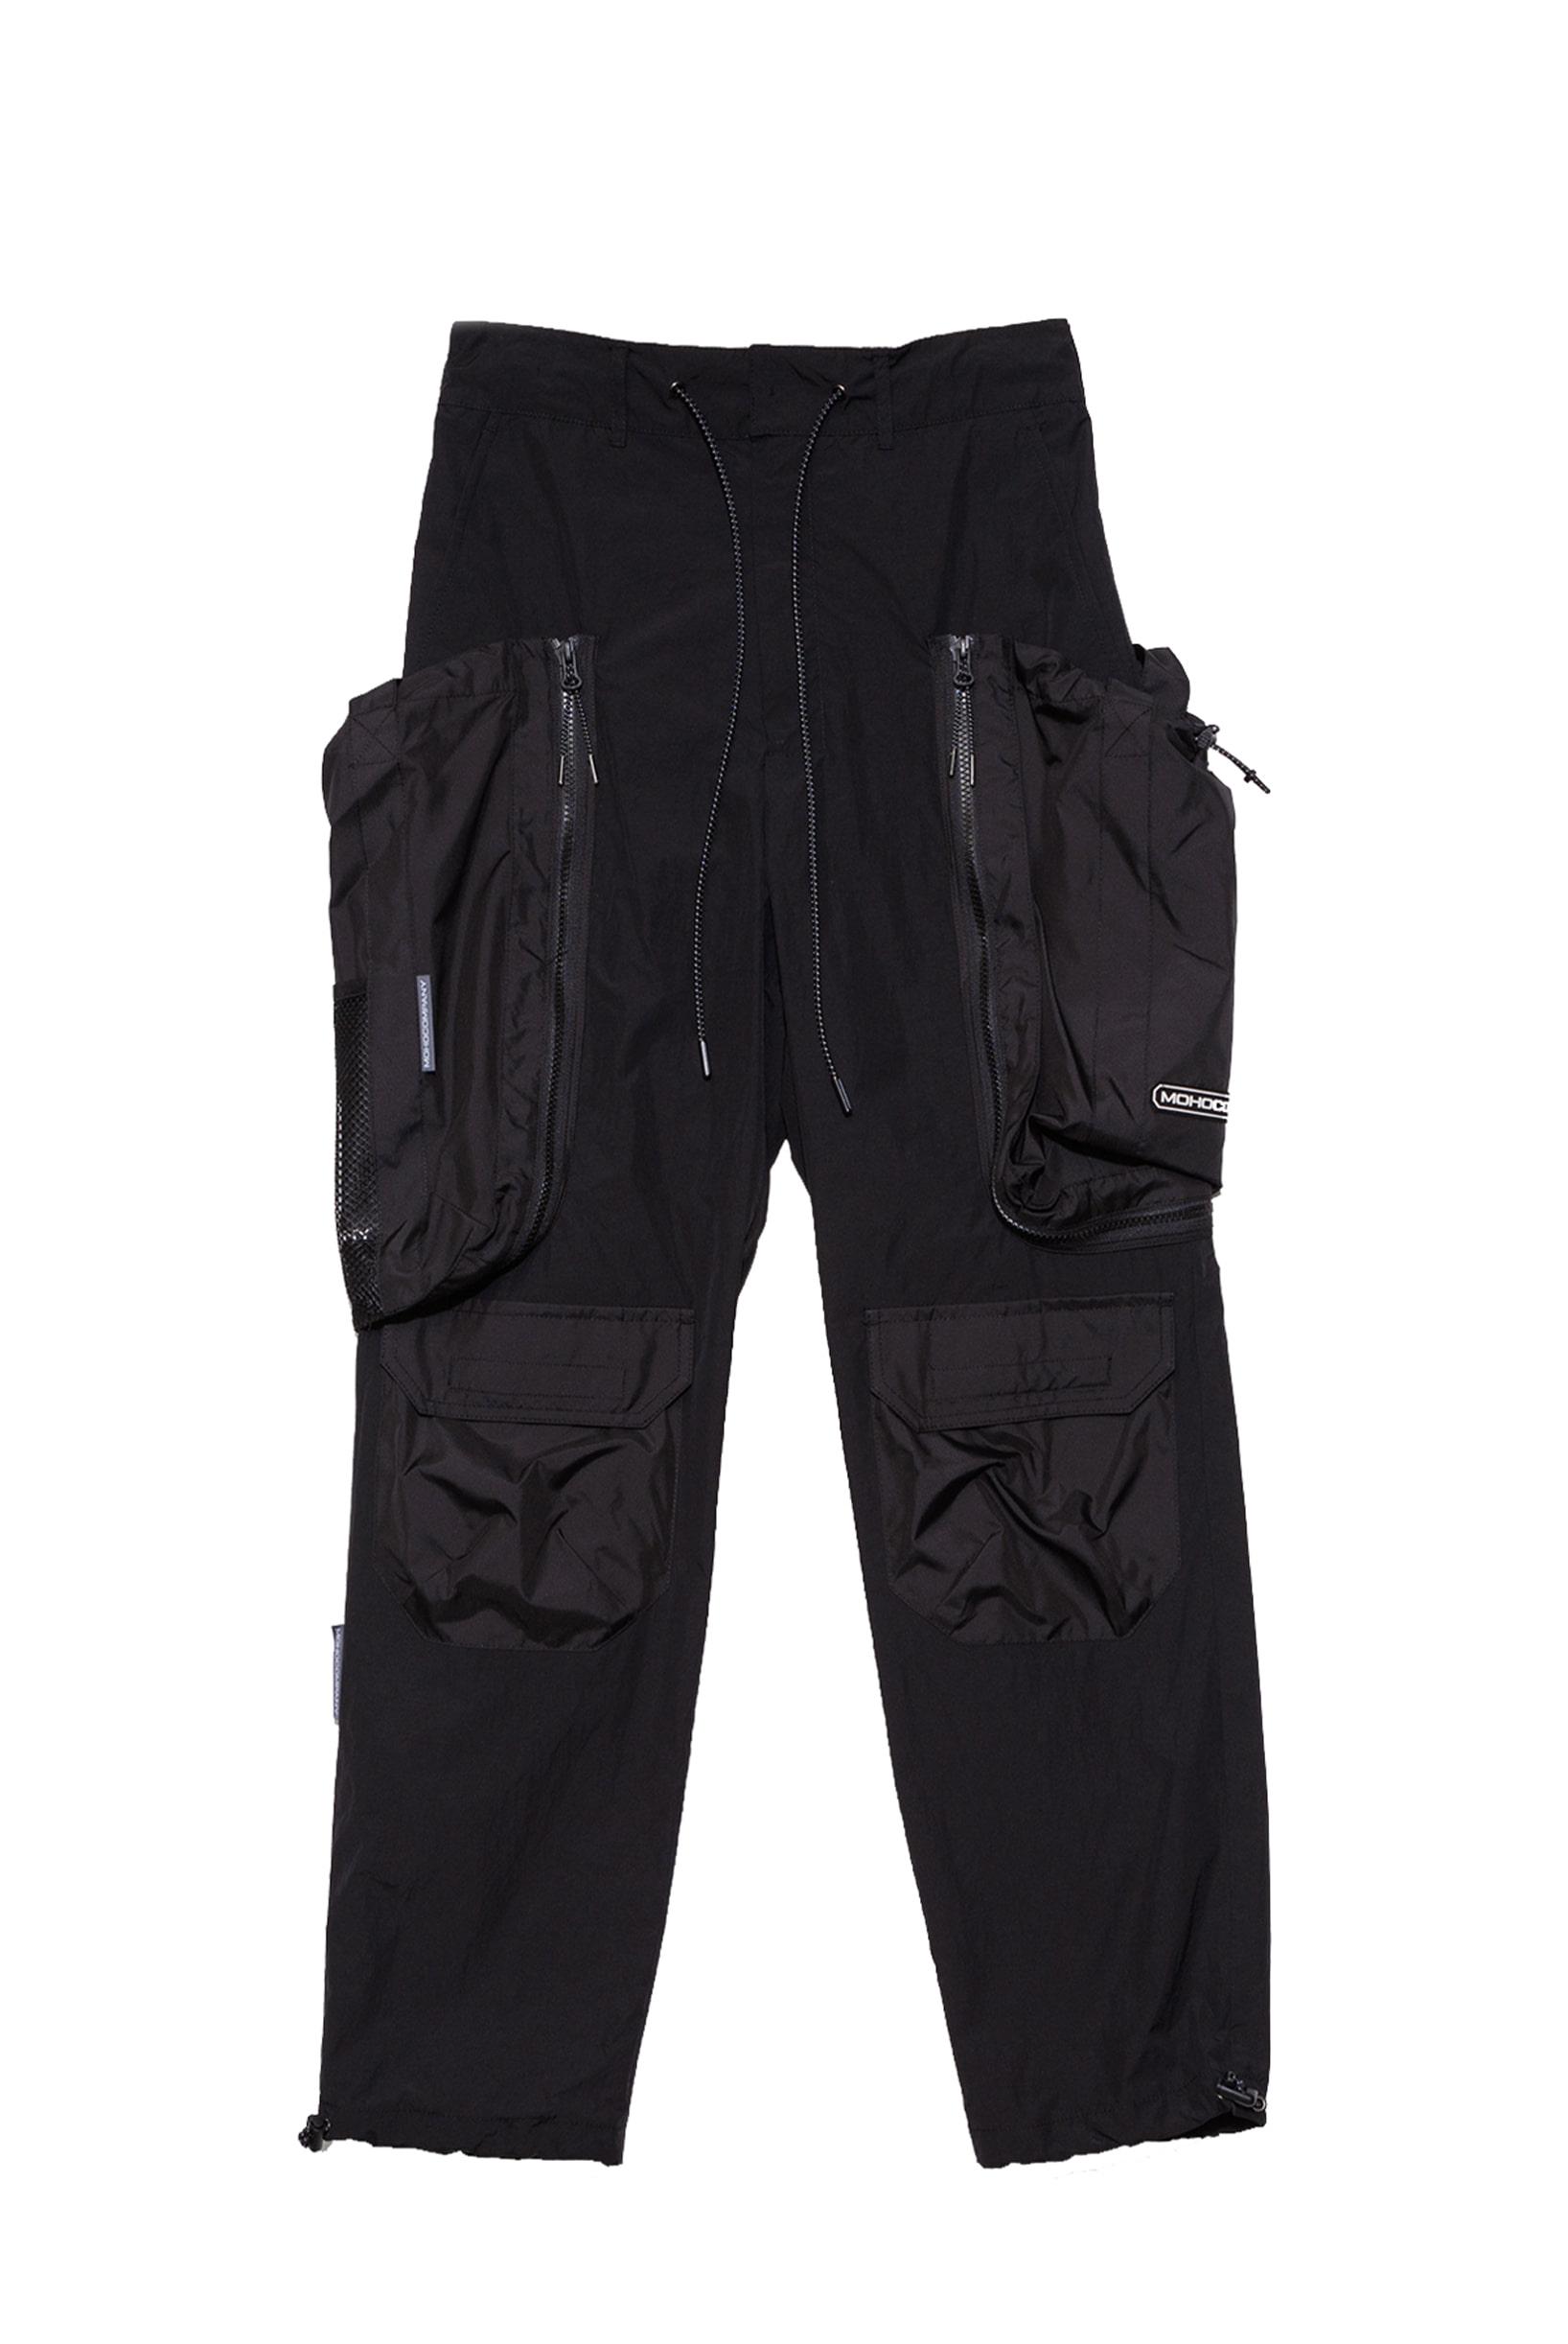 DETACHABLE BAG TREKKING PANTS (BLACK)